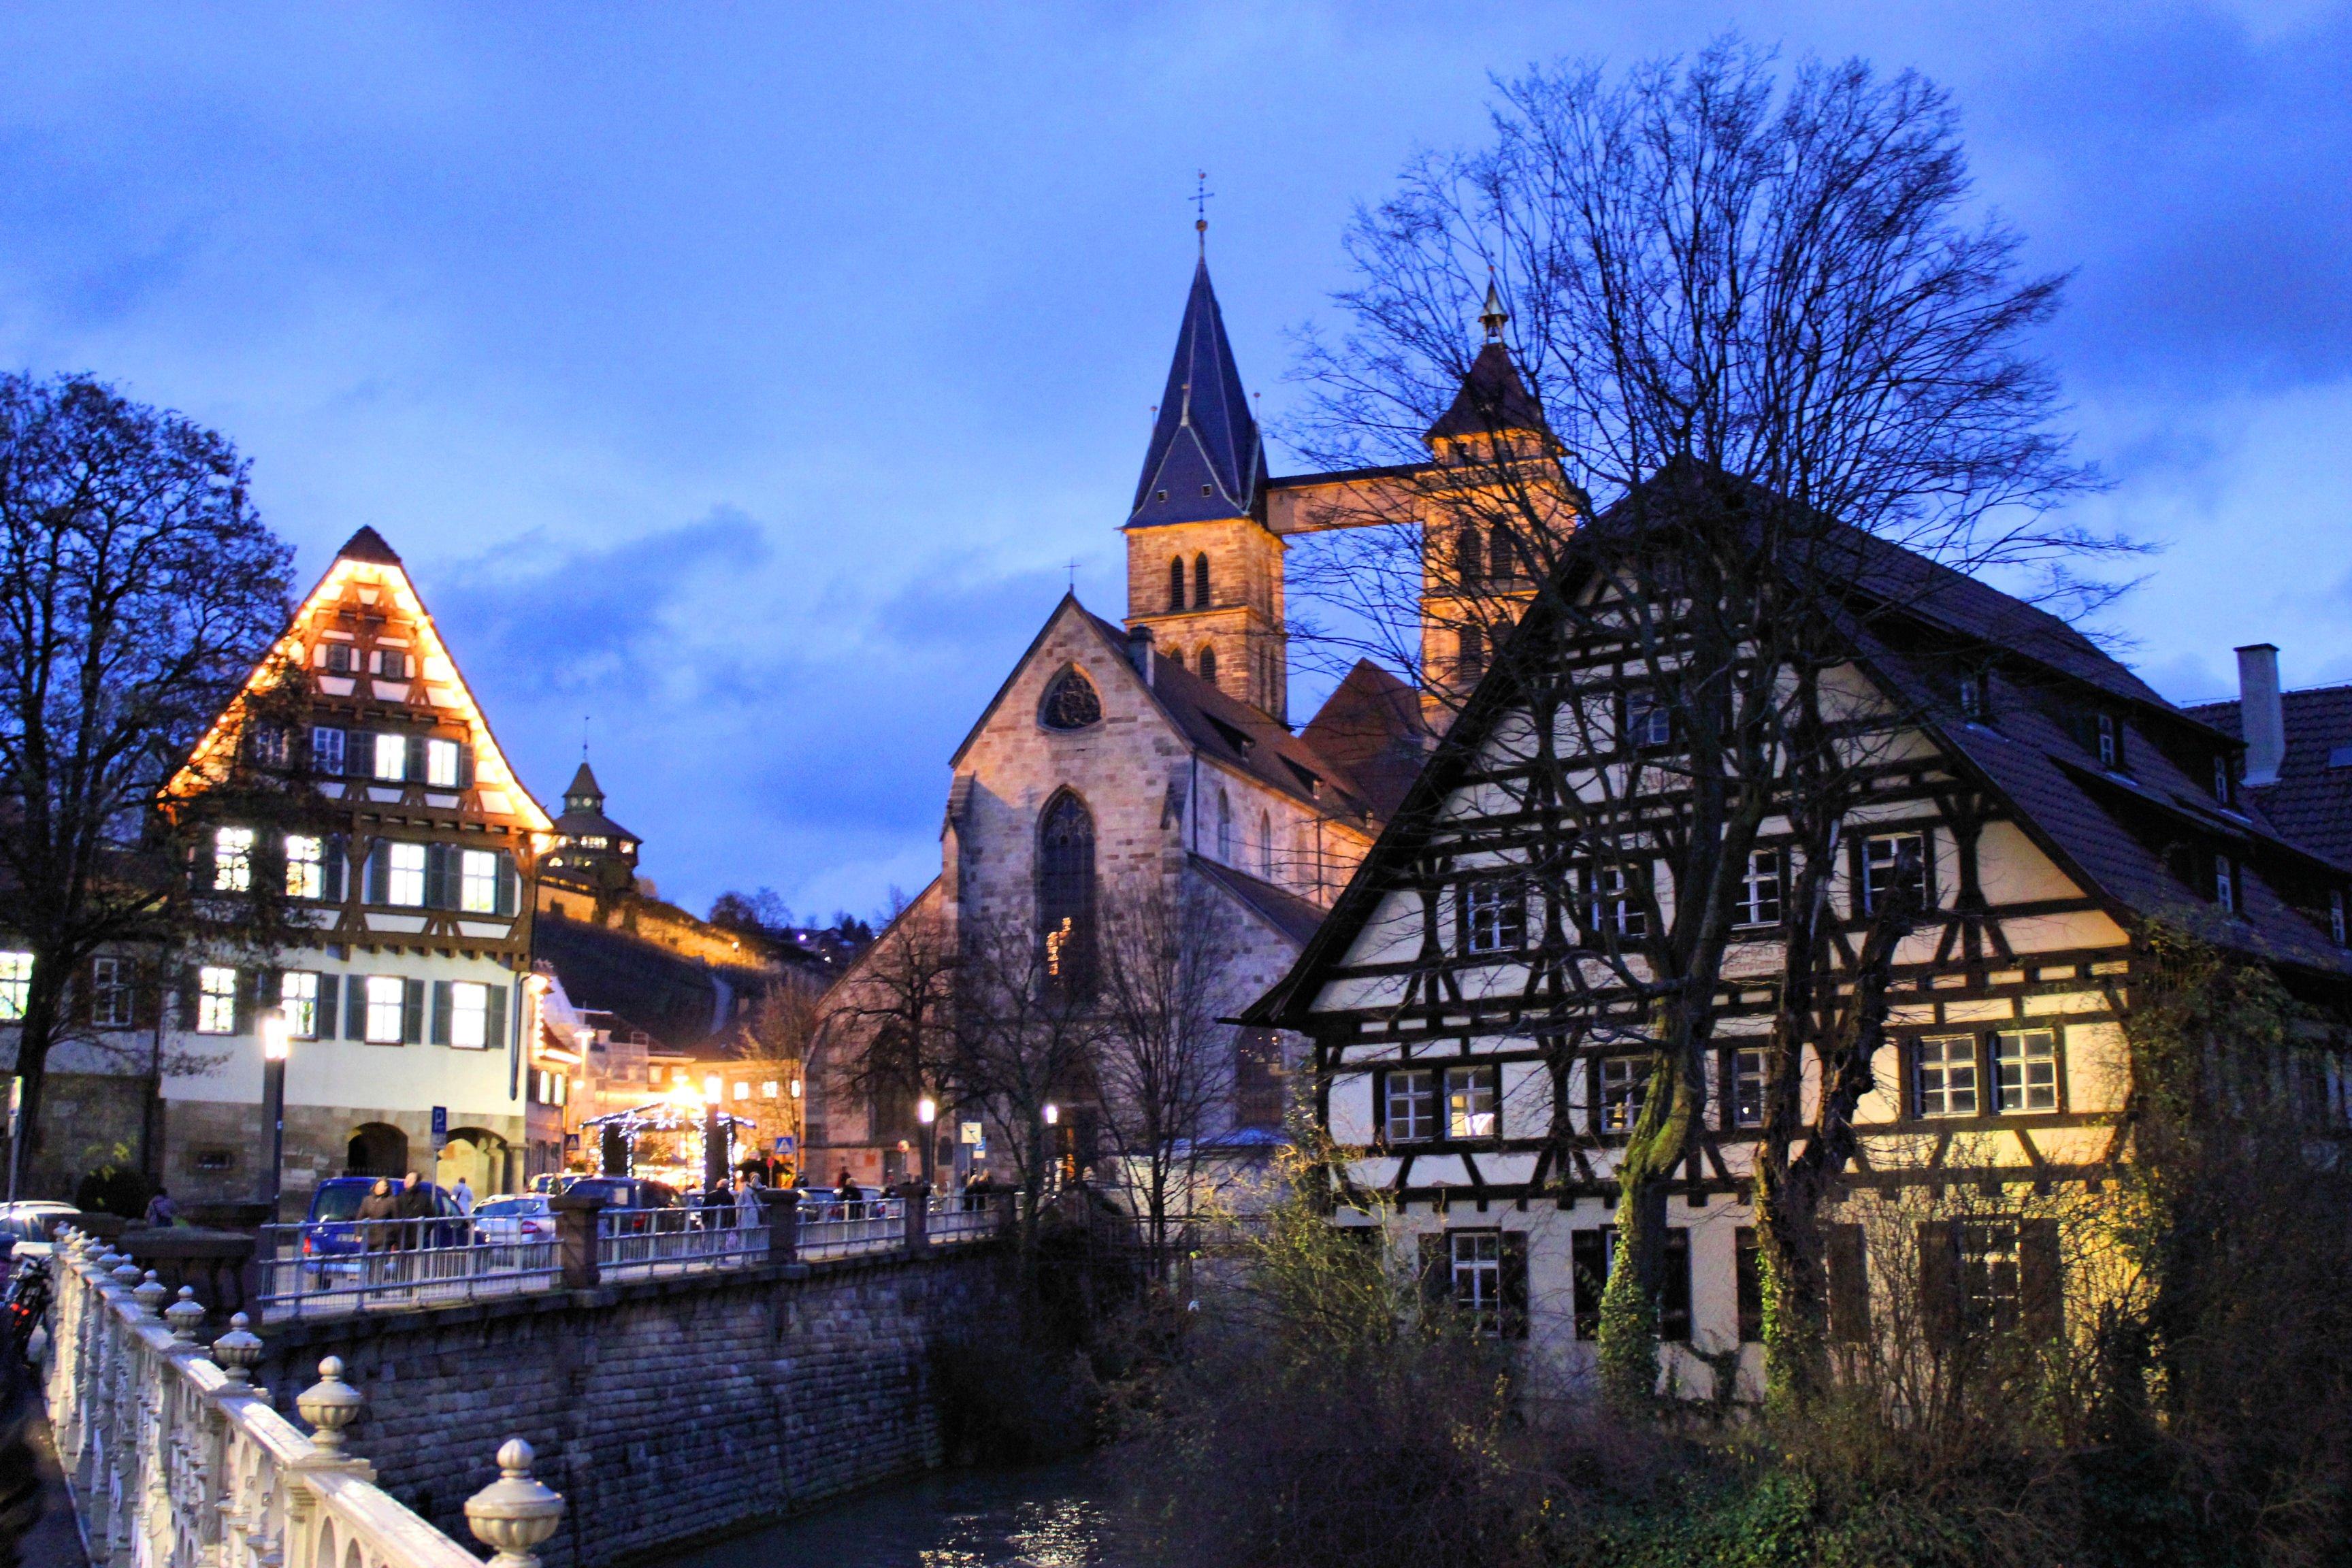 Fall Fairy Wallpaper Vacation Photos Part 4 Esslingen Favorite German Town